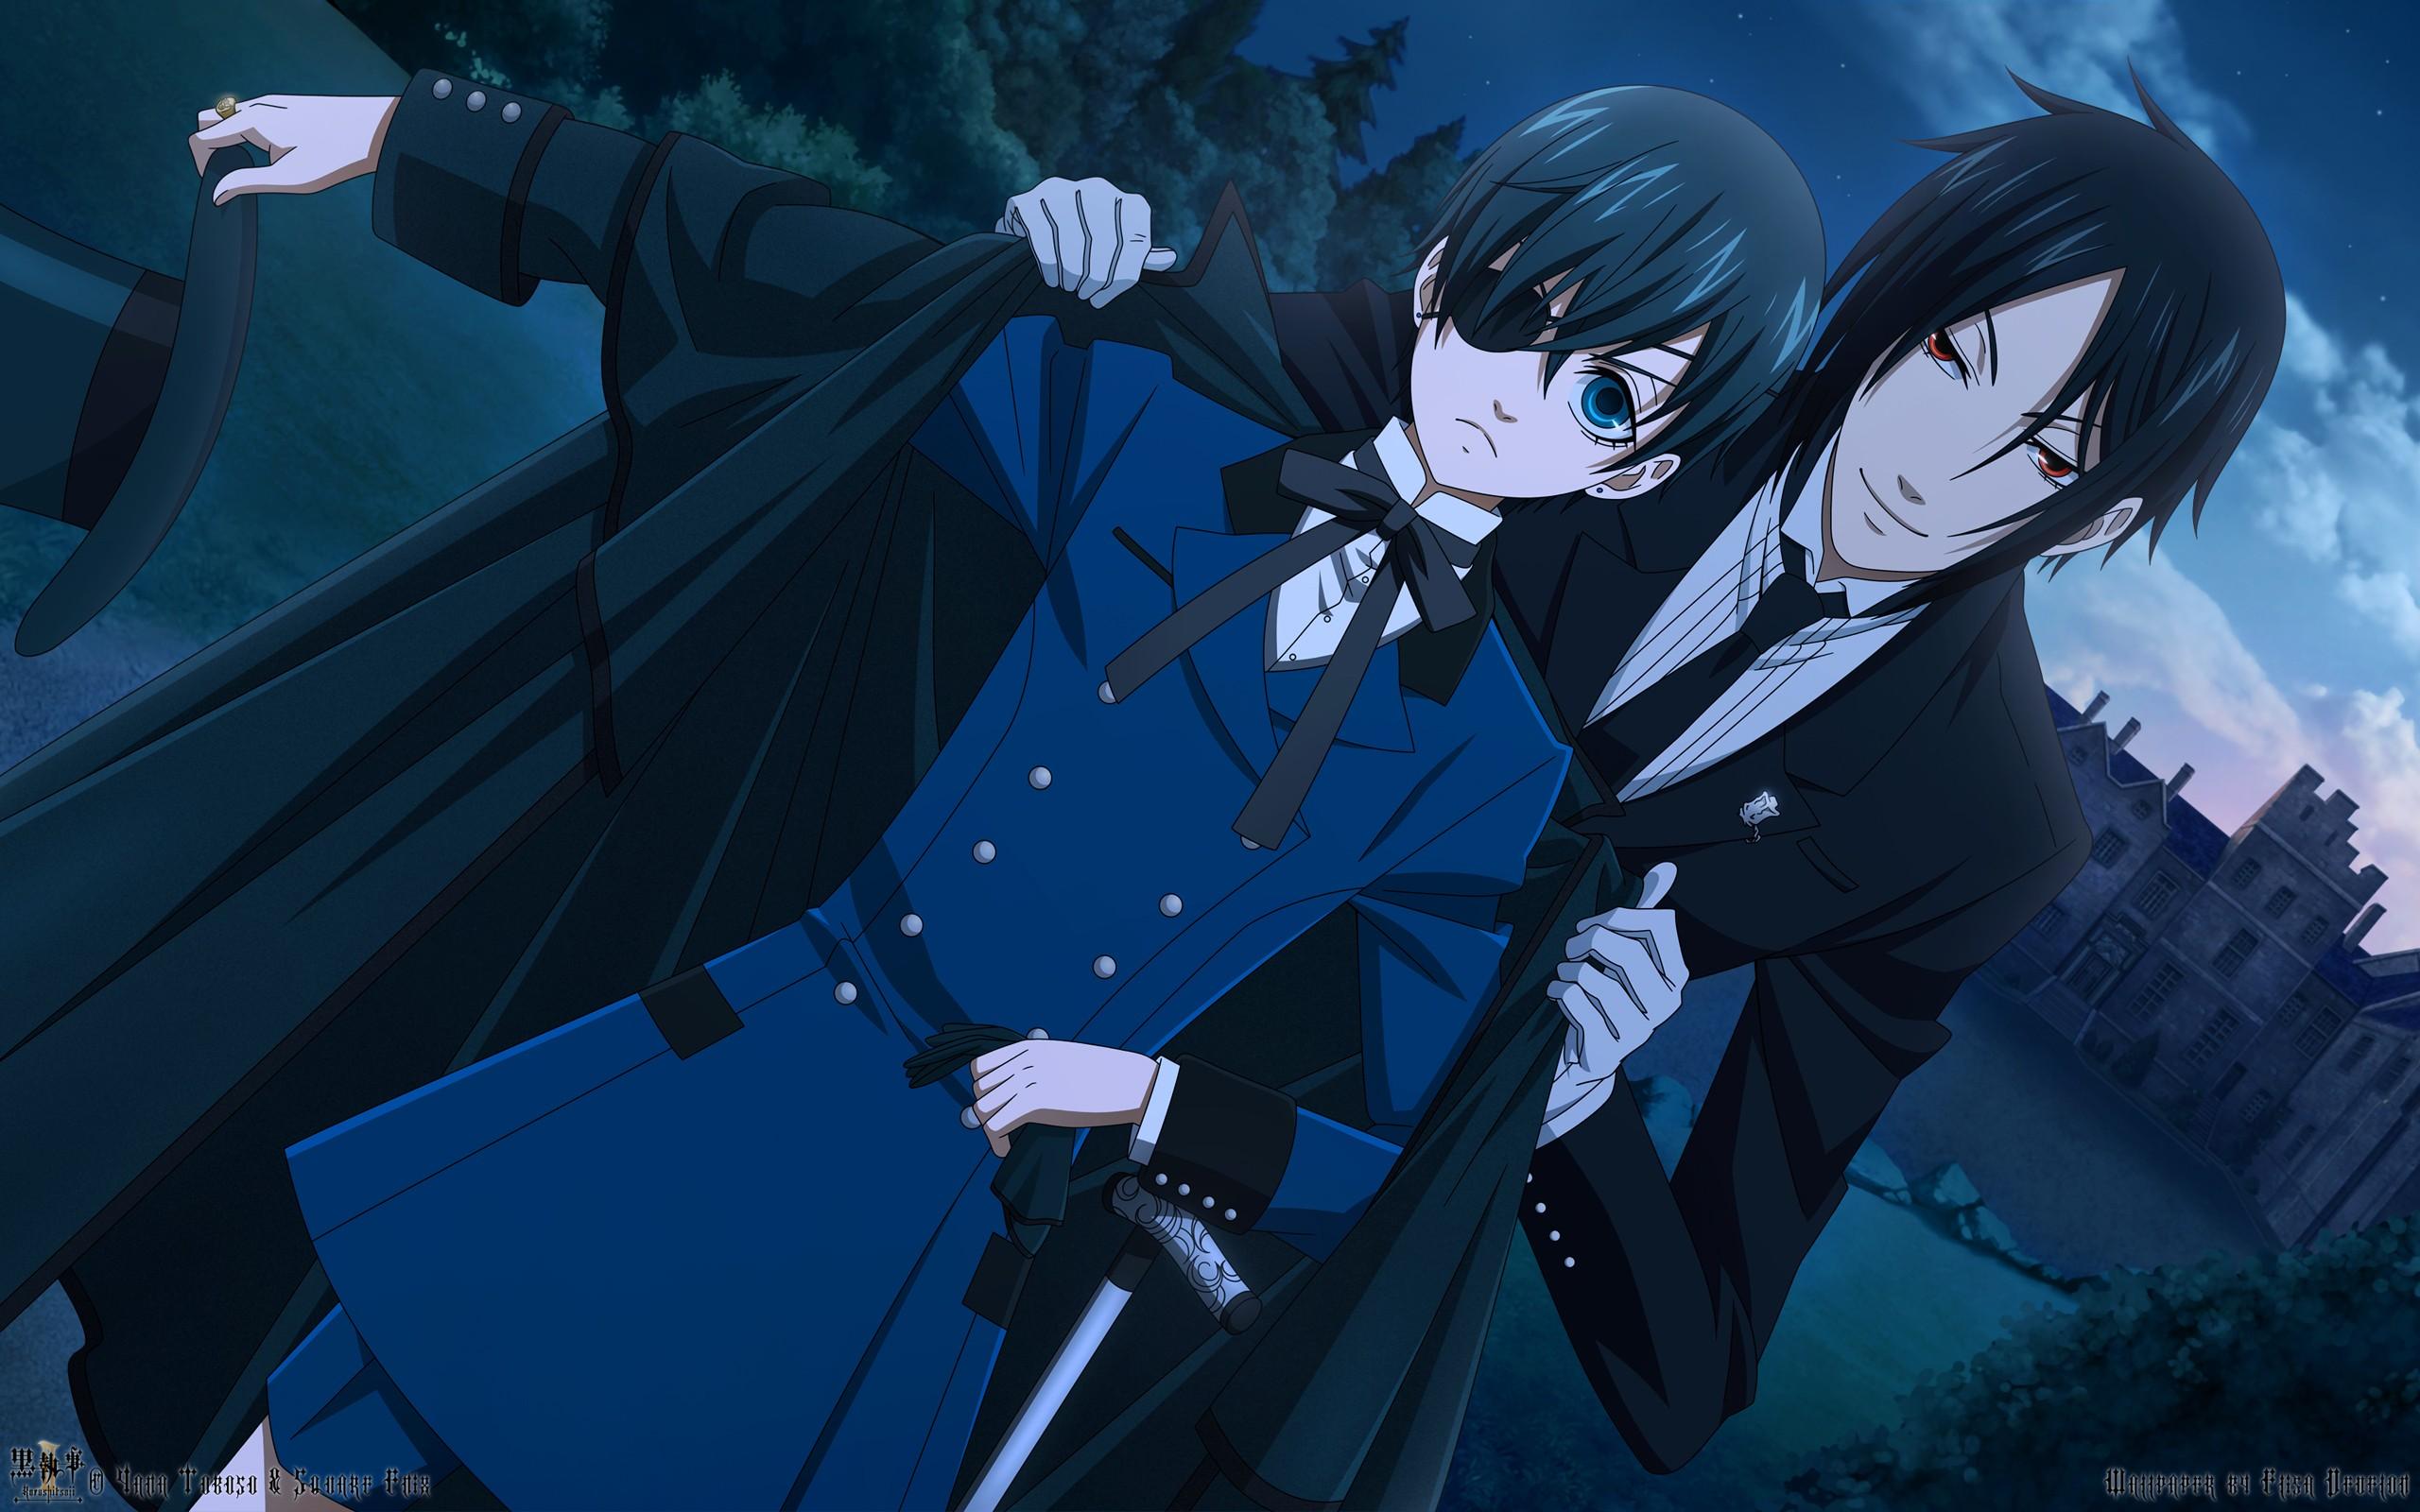 Illustration Anime Kuroshitsuji Michaelis Sebastian Ciel Phantomhive Black Butler Screenshot Mangaka